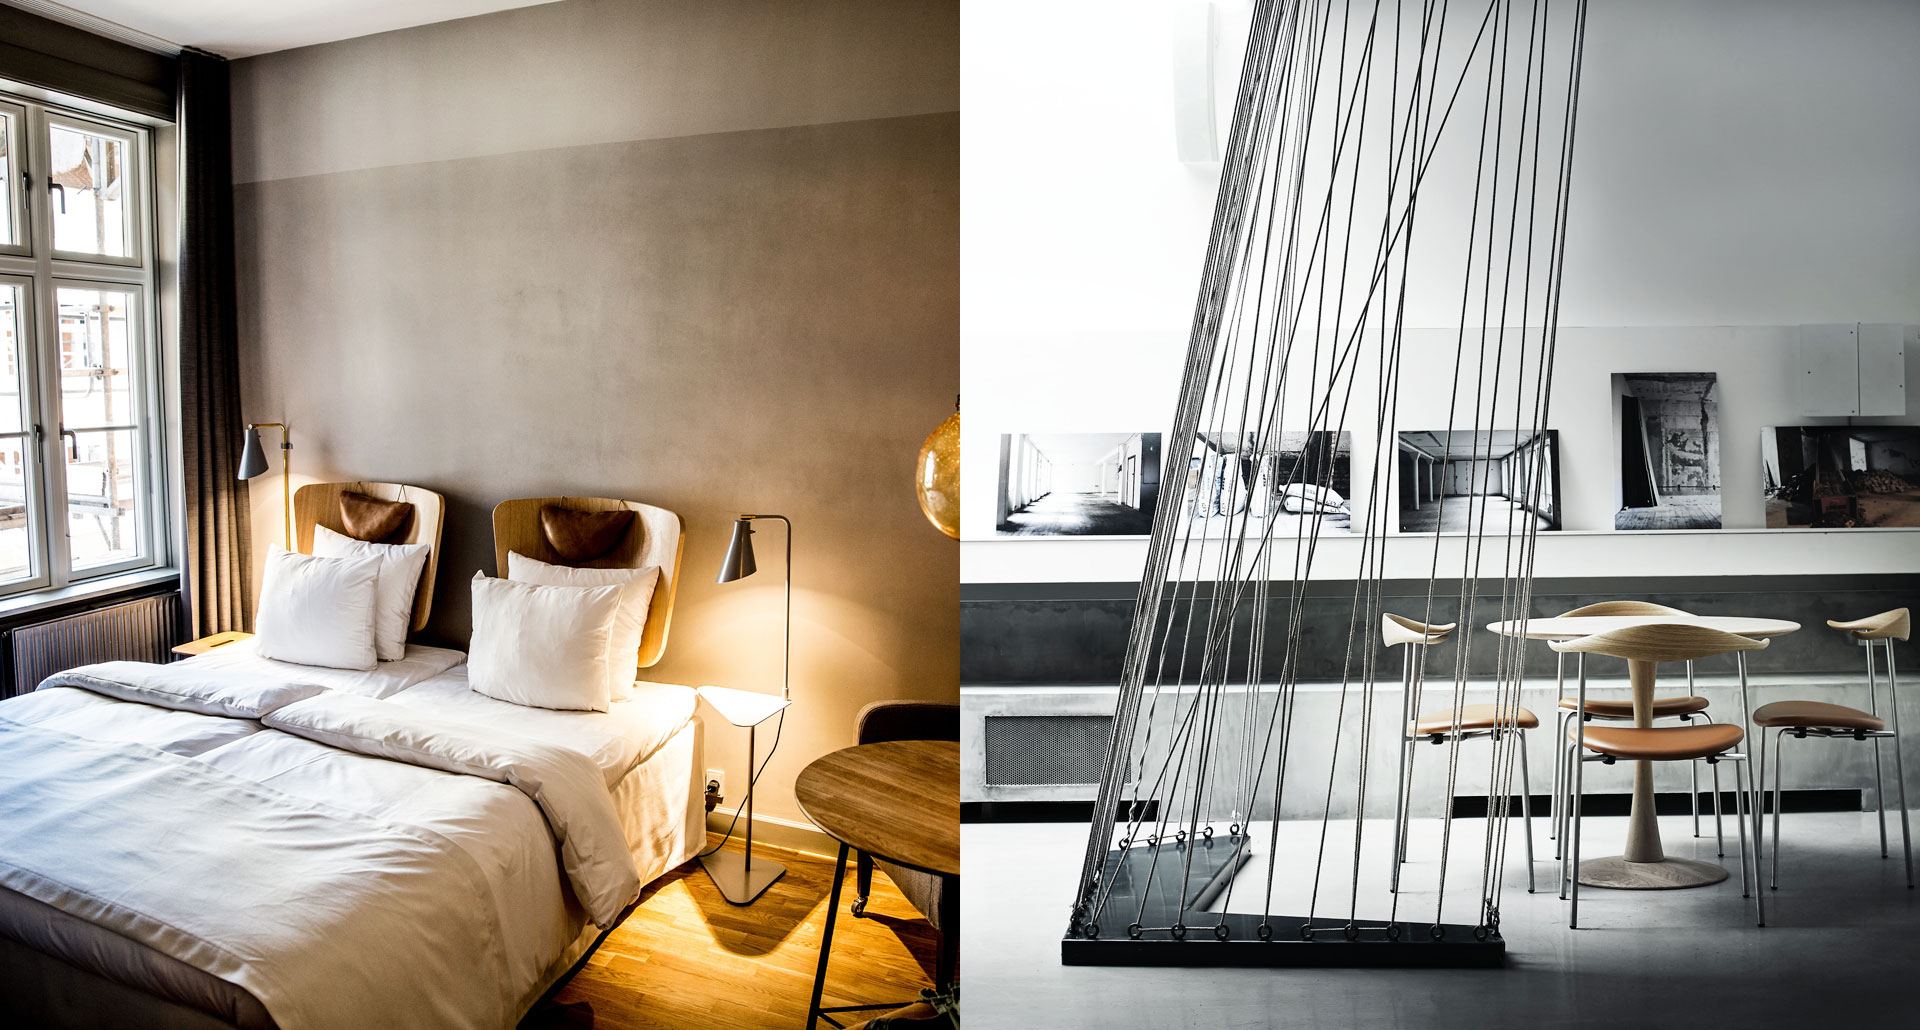 Hotel SP34 boutique hotel in Copenhagen, Denmark